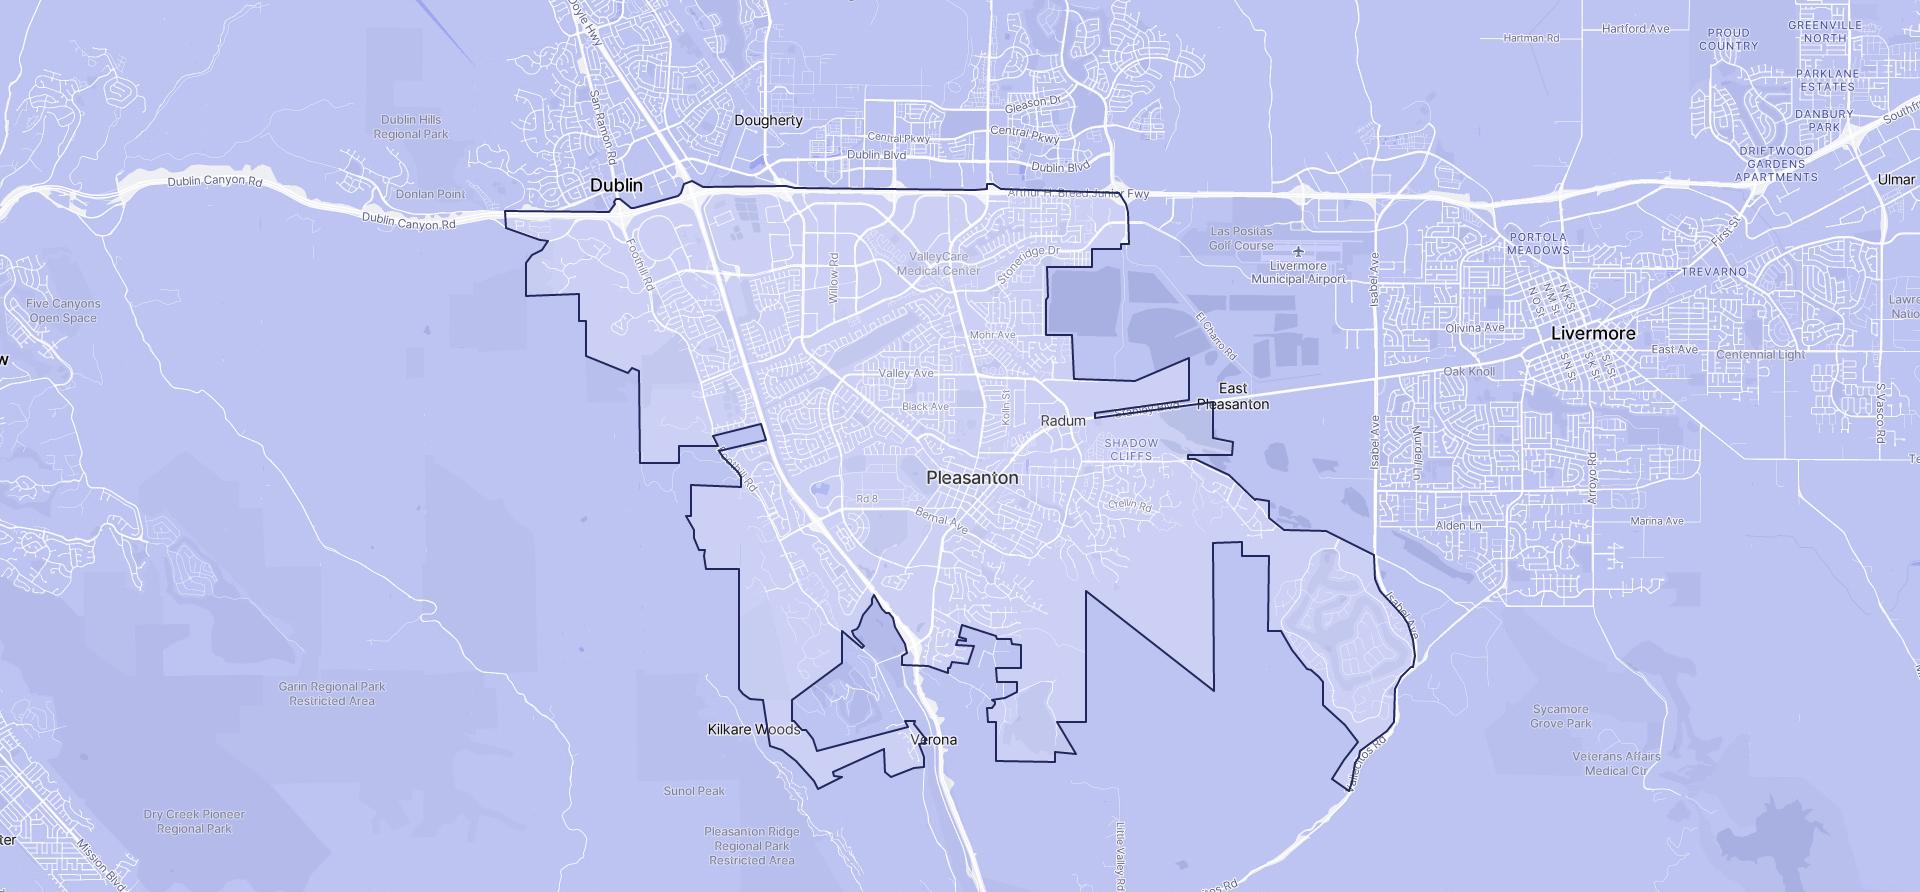 Image of Pleasanton boundaries on a map.